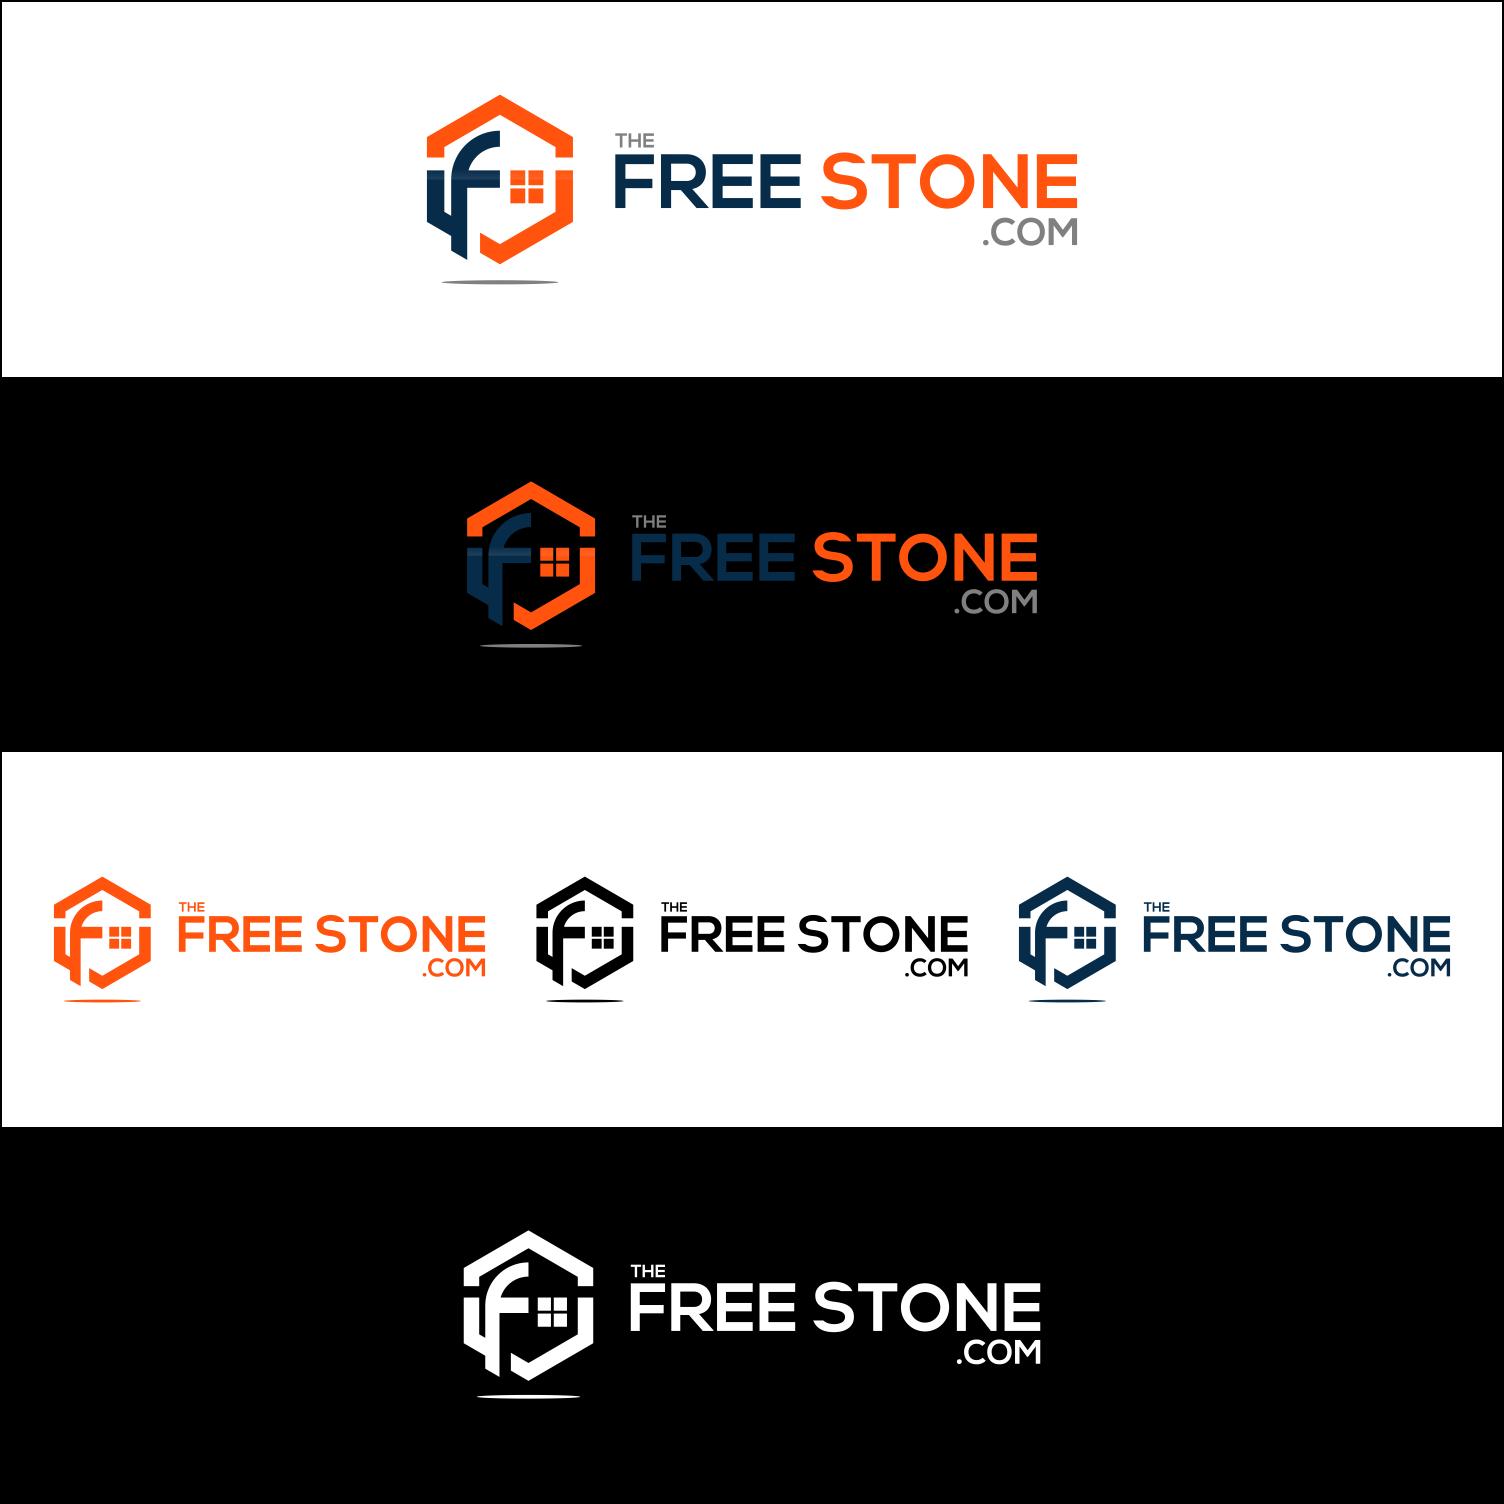 Create a modern logo for FreeStone.